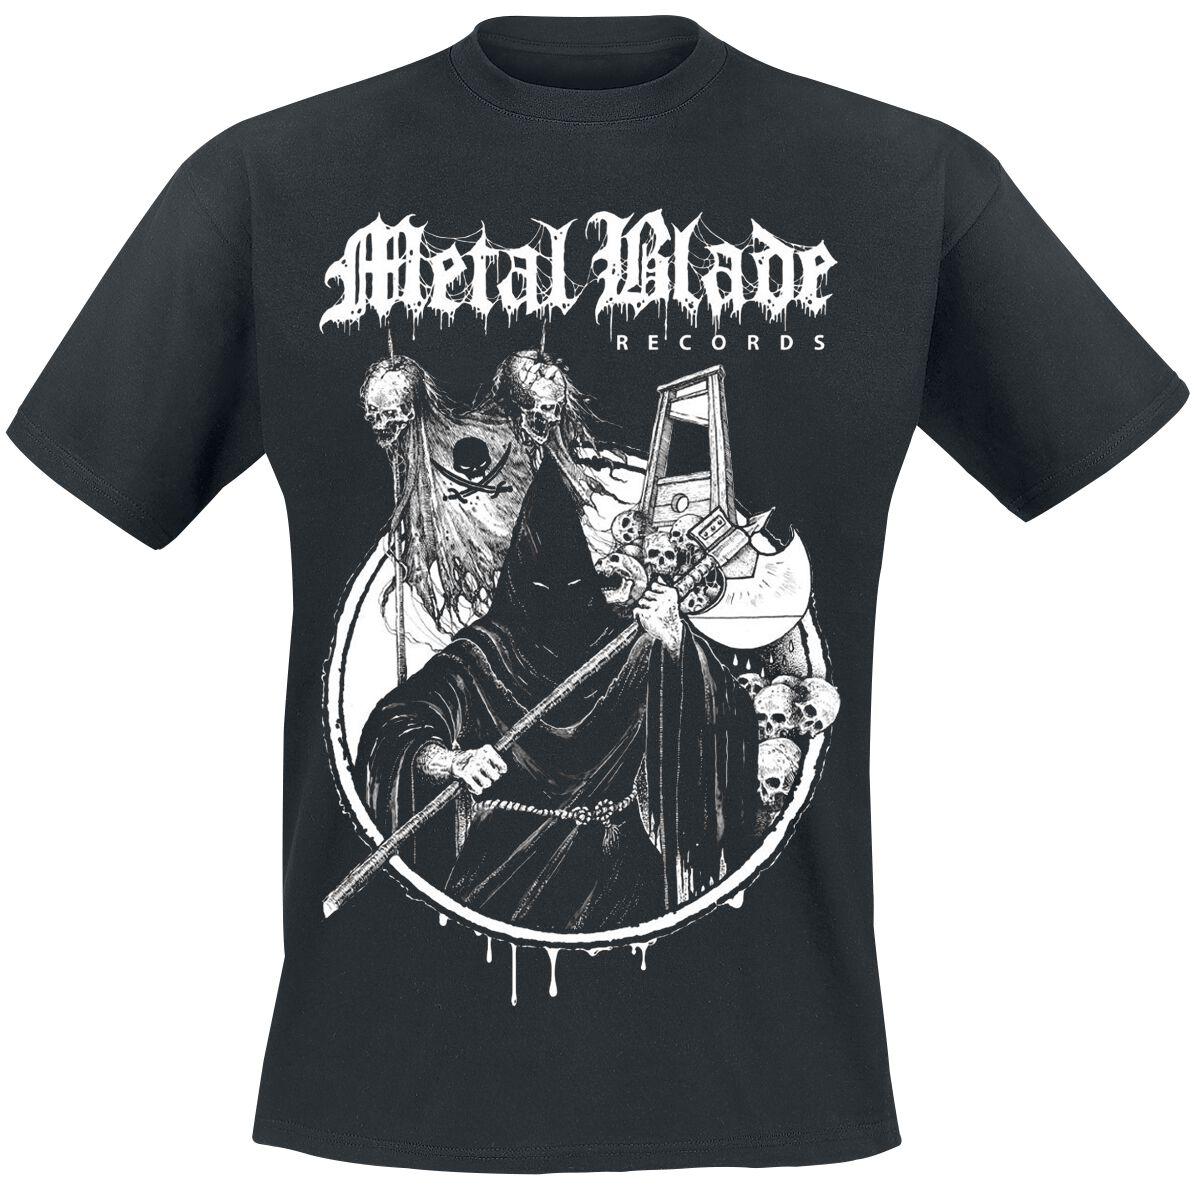 Zespoły - Koszulki - T-Shirt Metal Blade Death Metal T-Shirt czarny - 318766